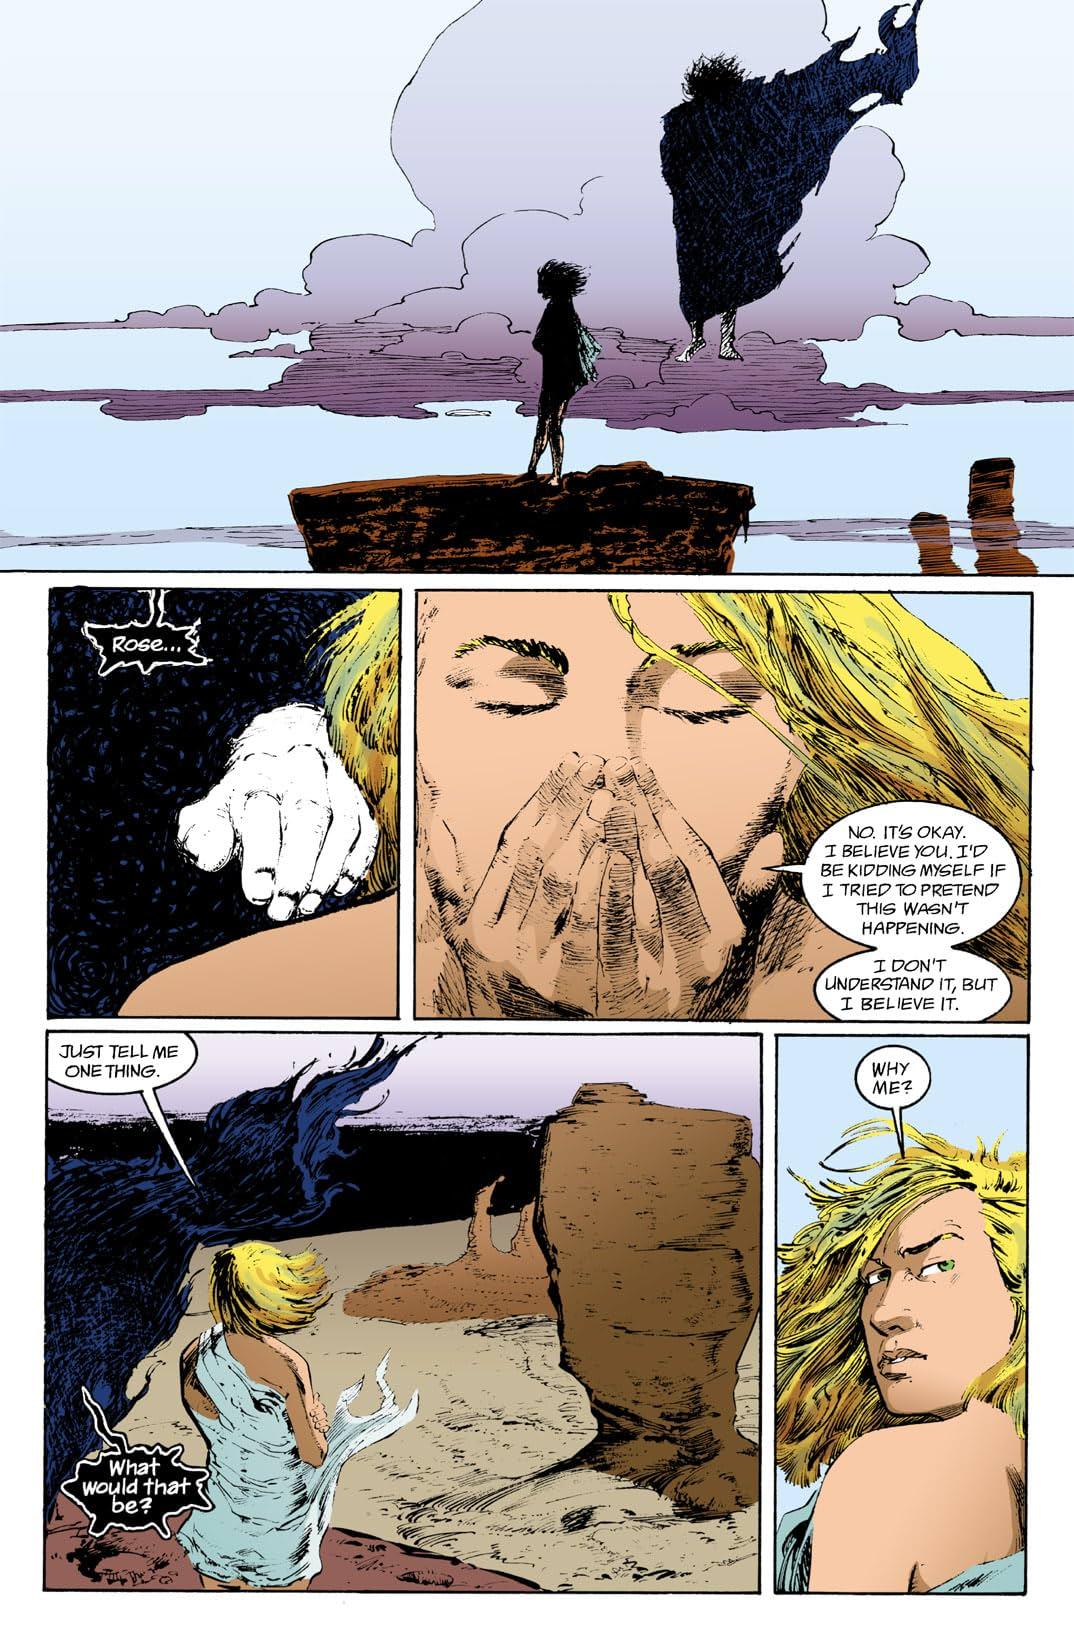 The Sandman #16